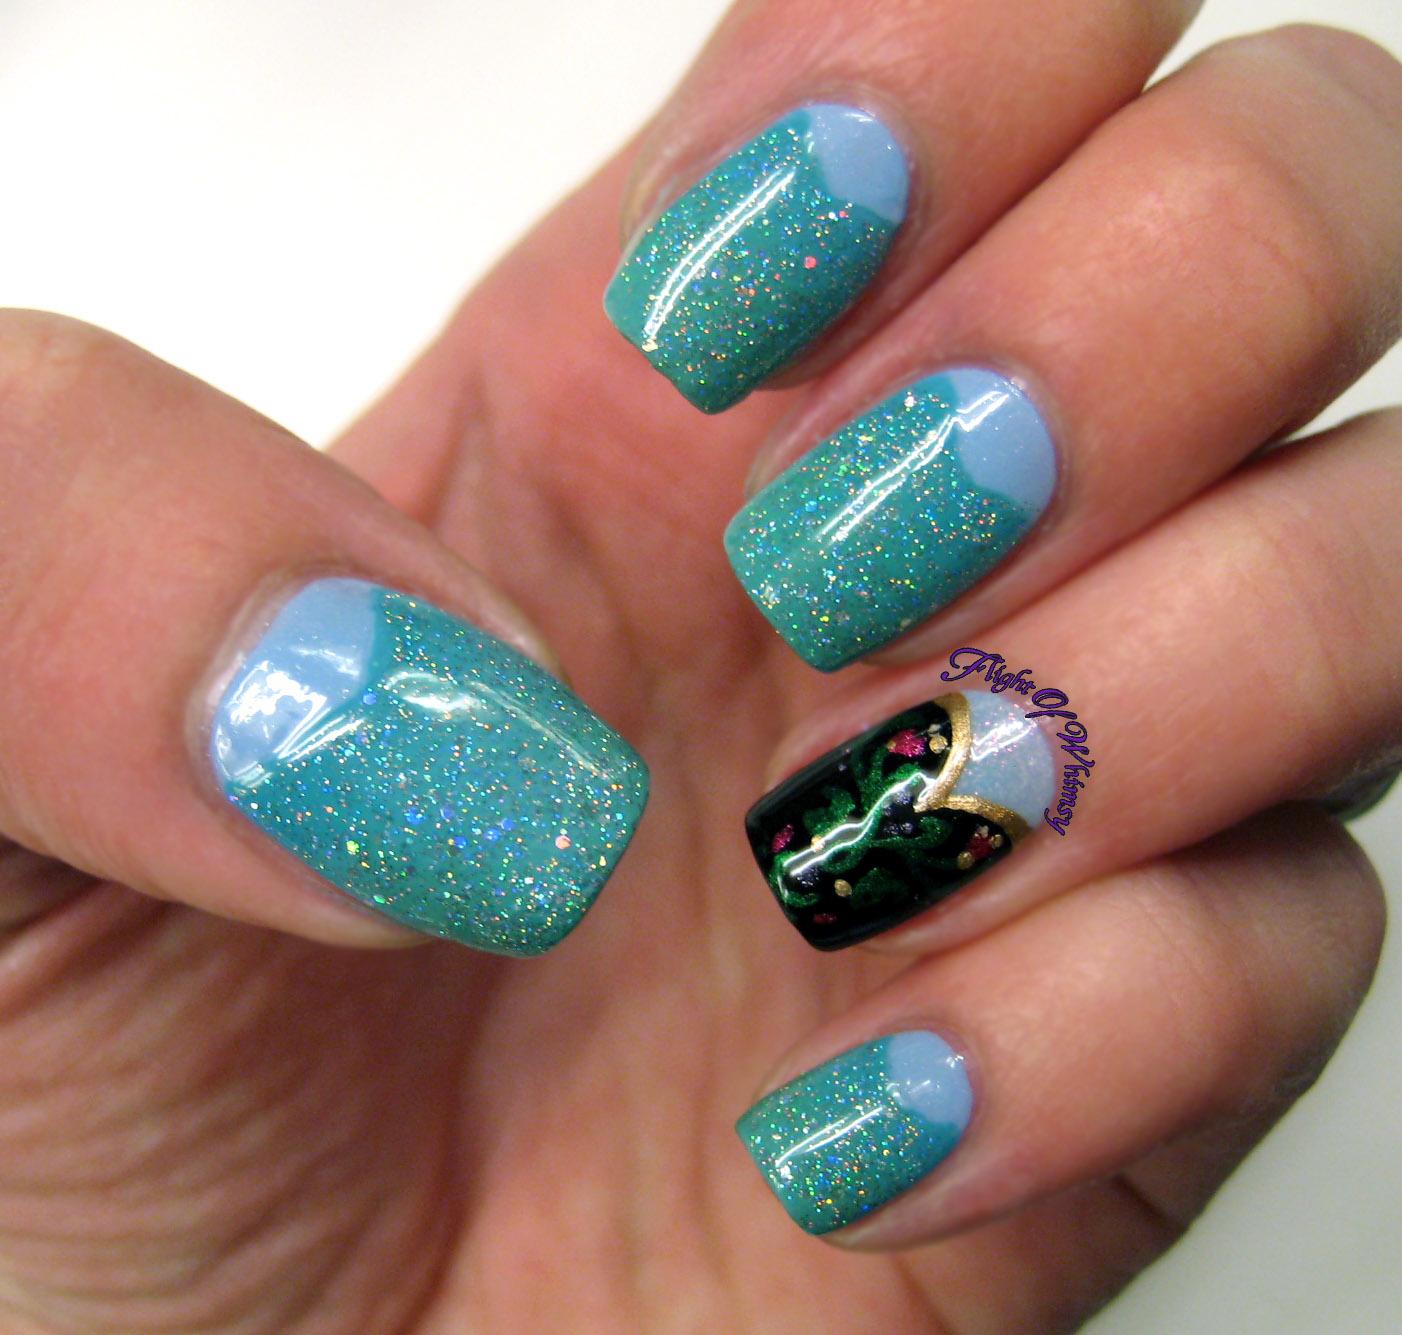 Princess Themed Nails: Flight Of Whimsy